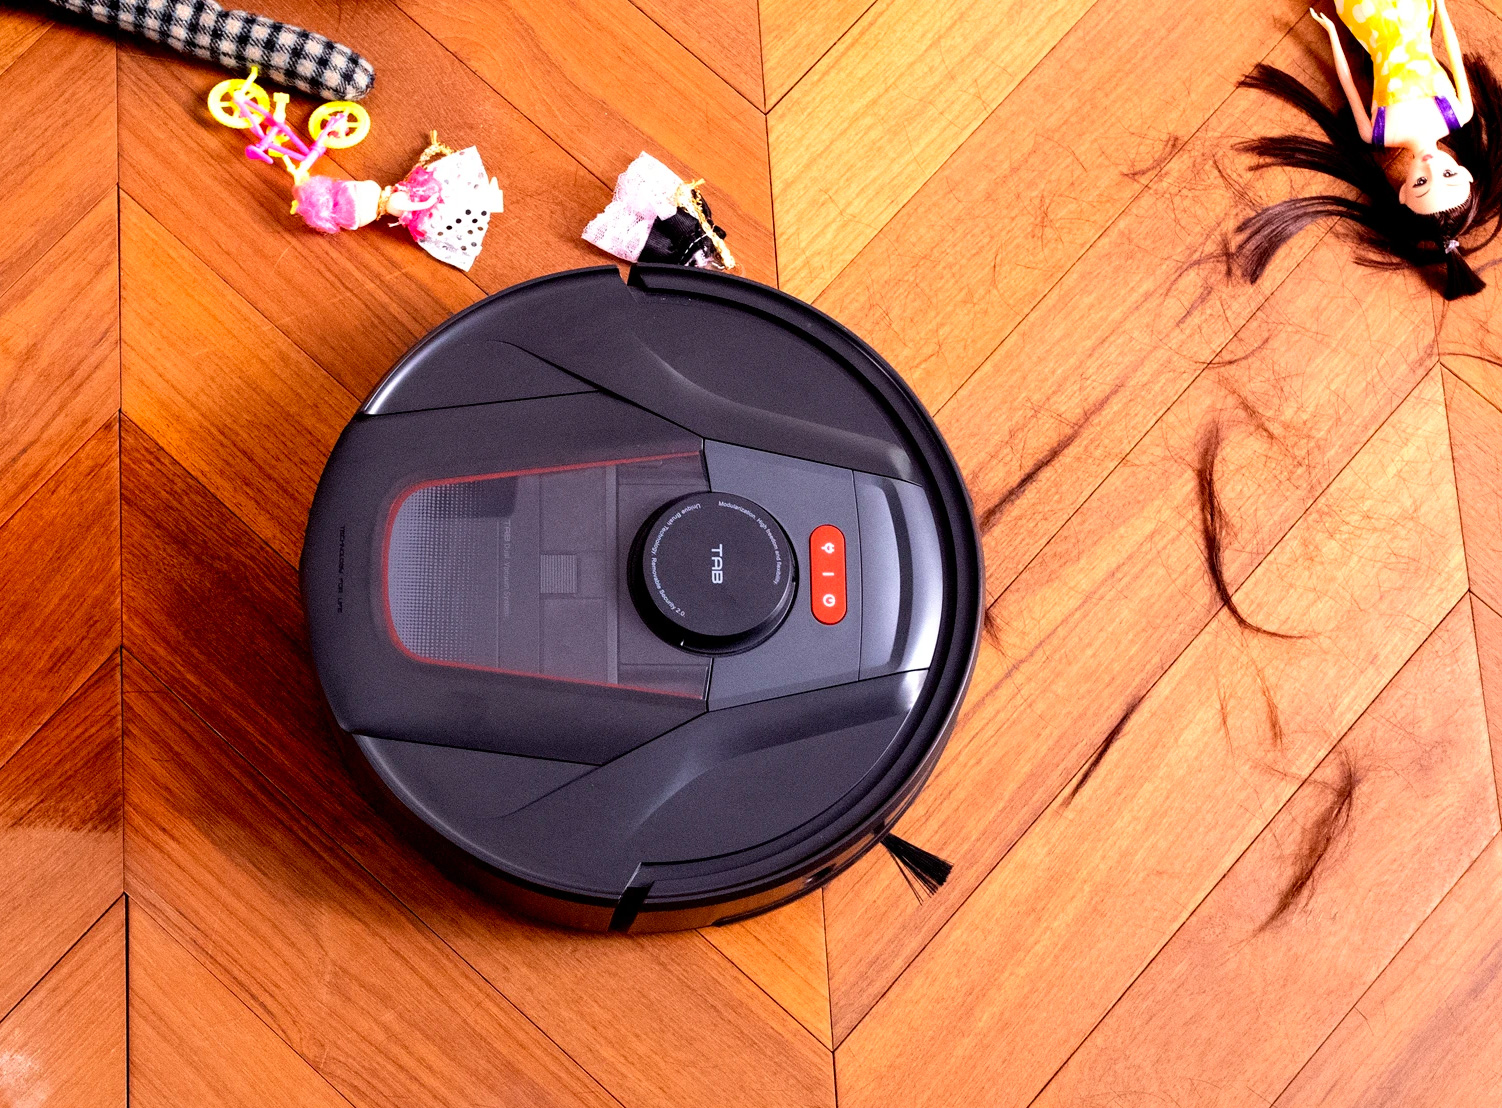 Haier Built A Better Bot For Your Floors at werd.com